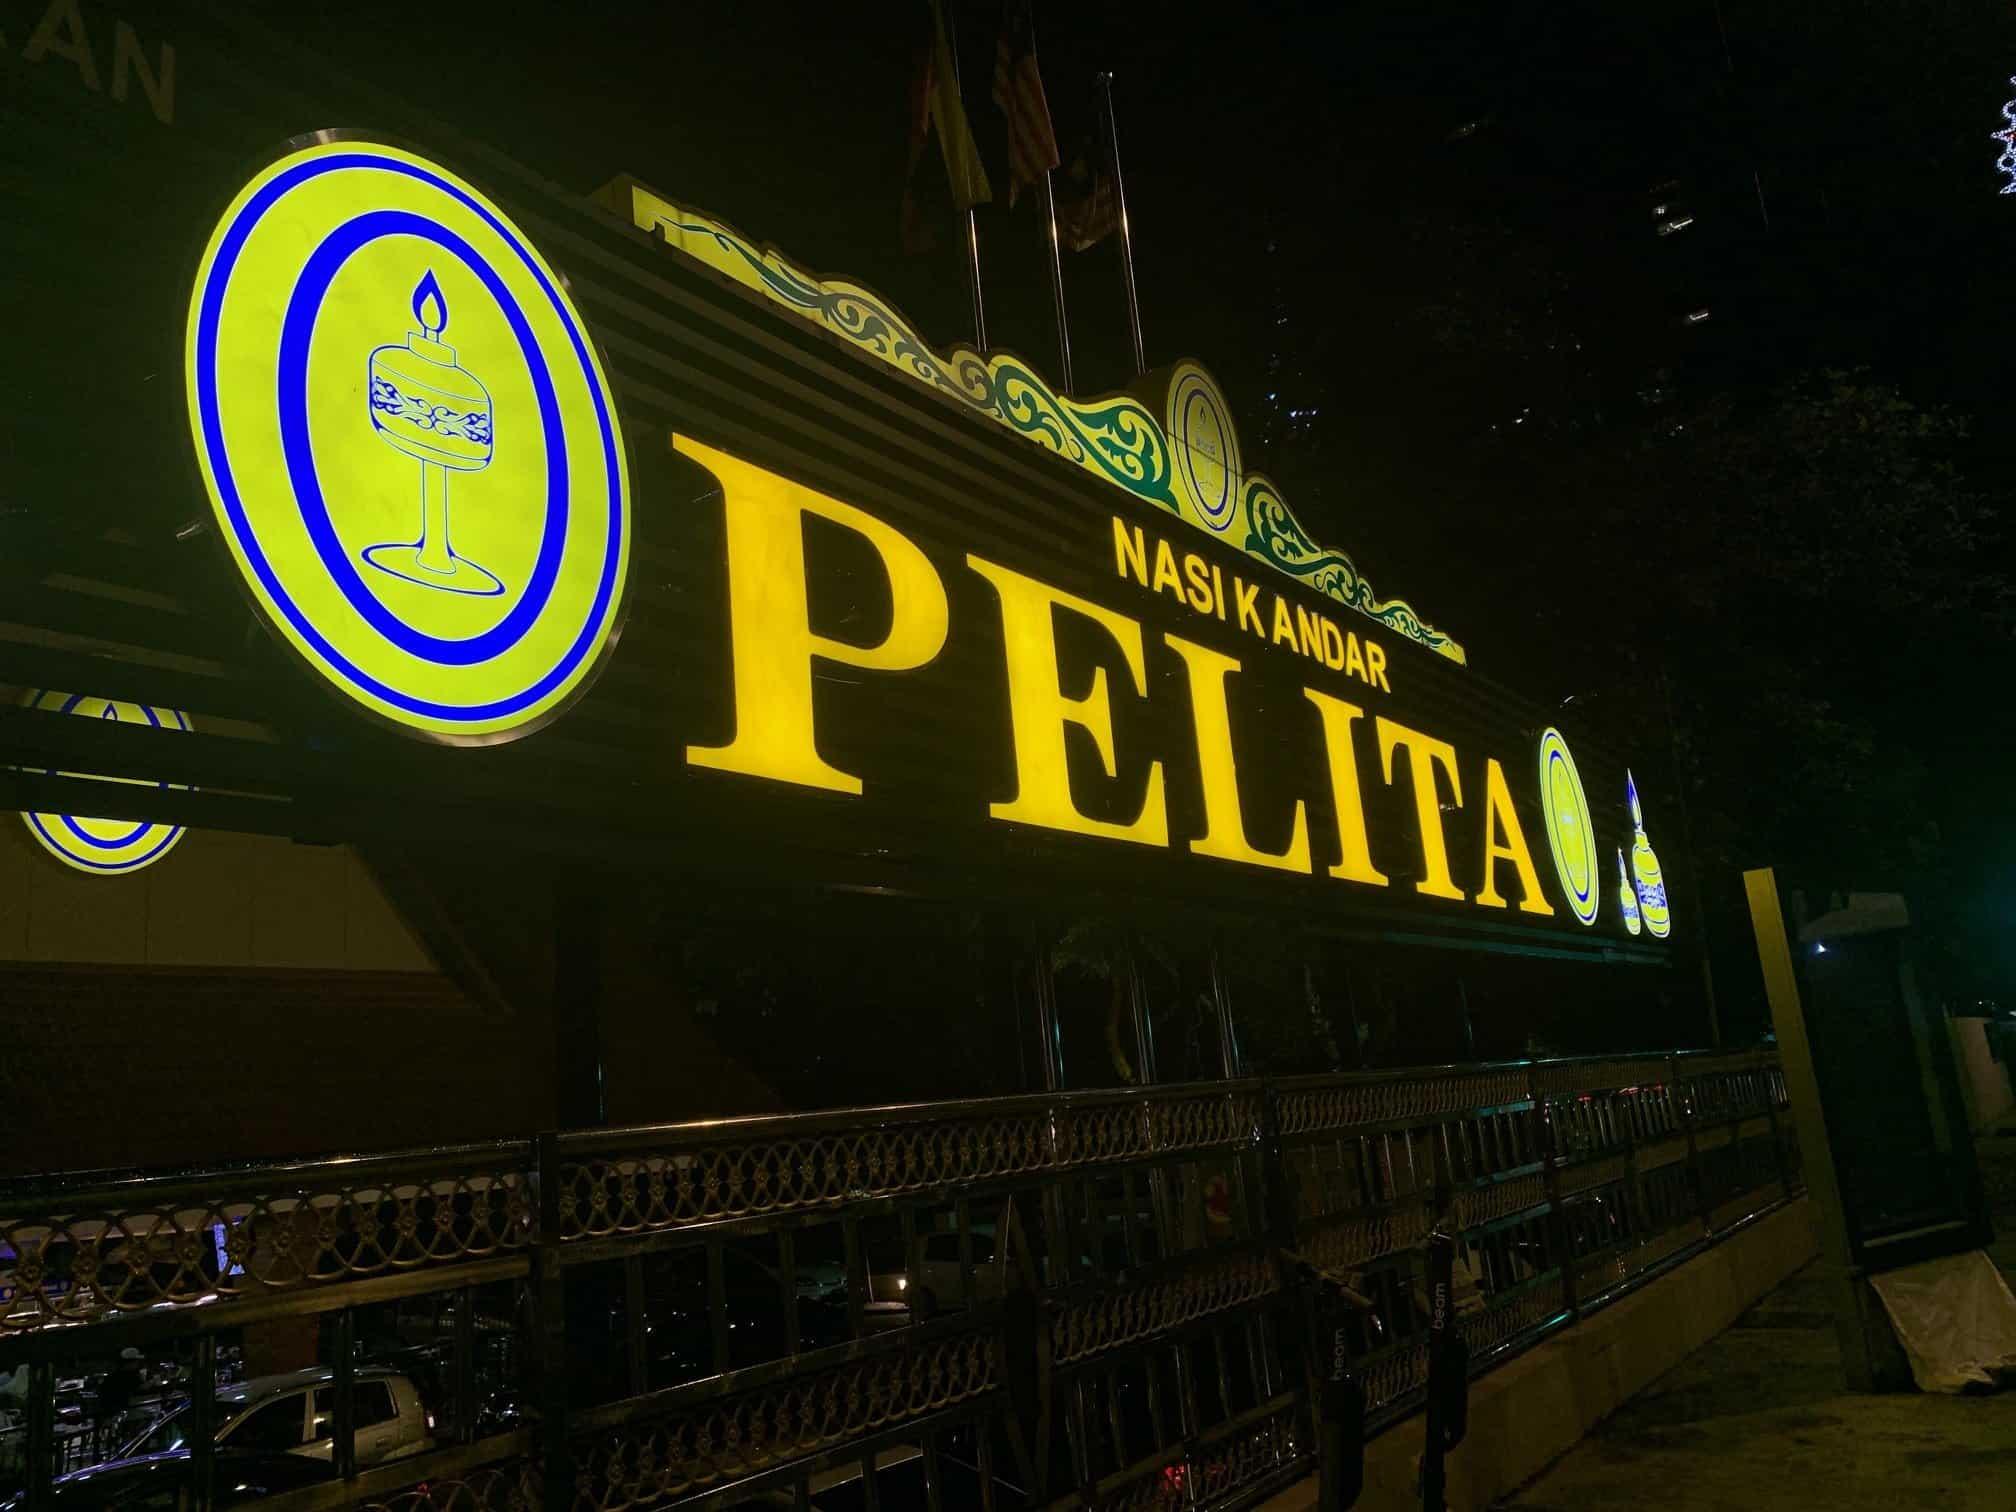 Pelita Nasi Kandar-a local favorite